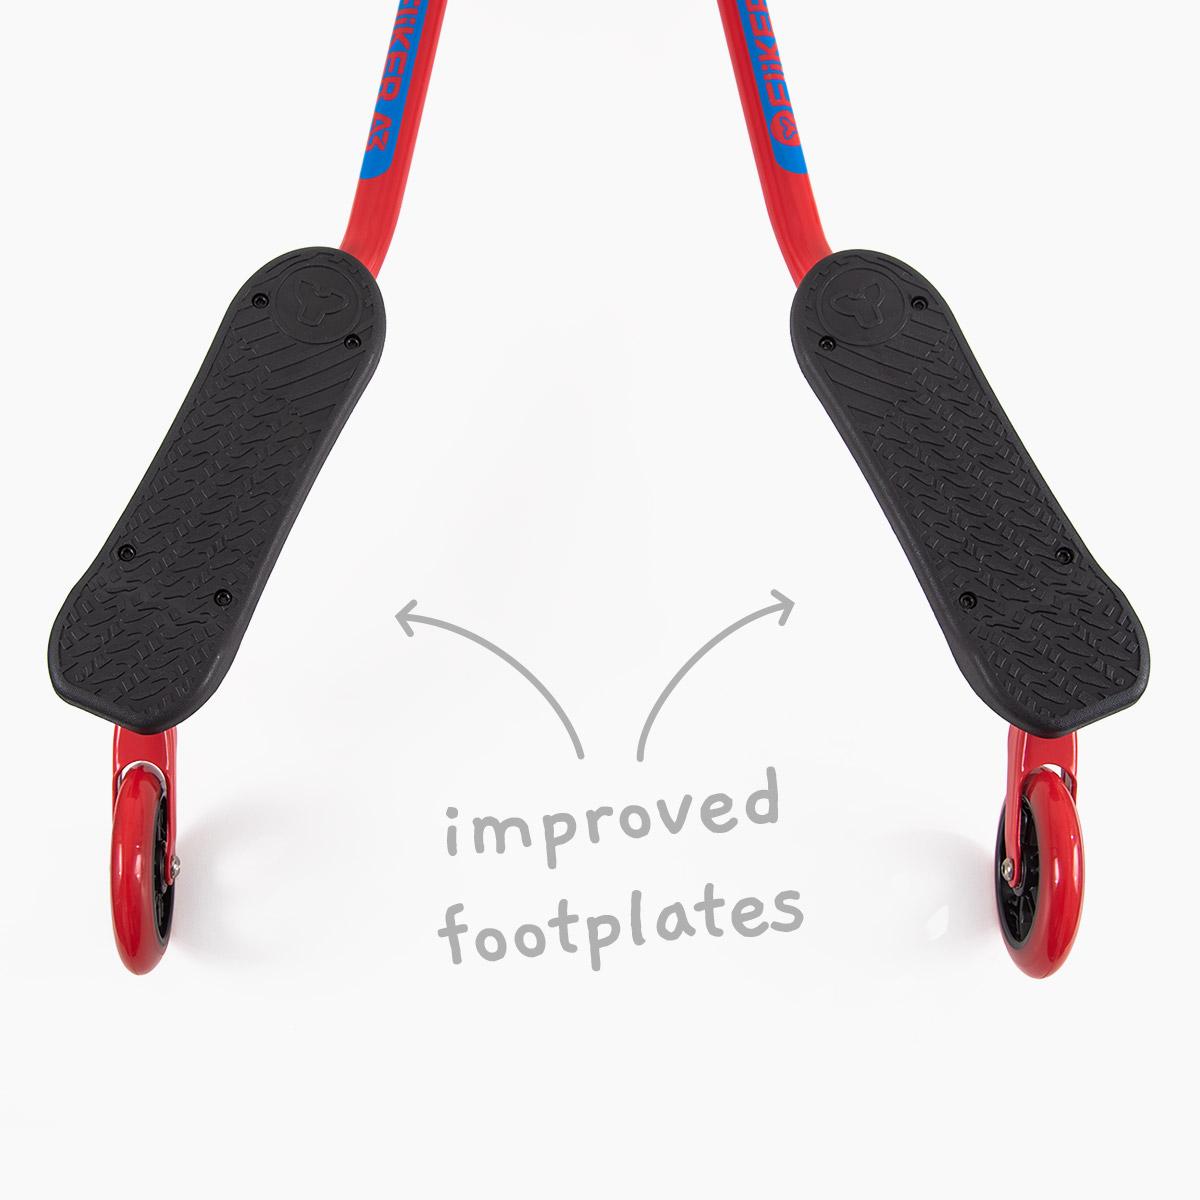 Improved footplates for maximum control